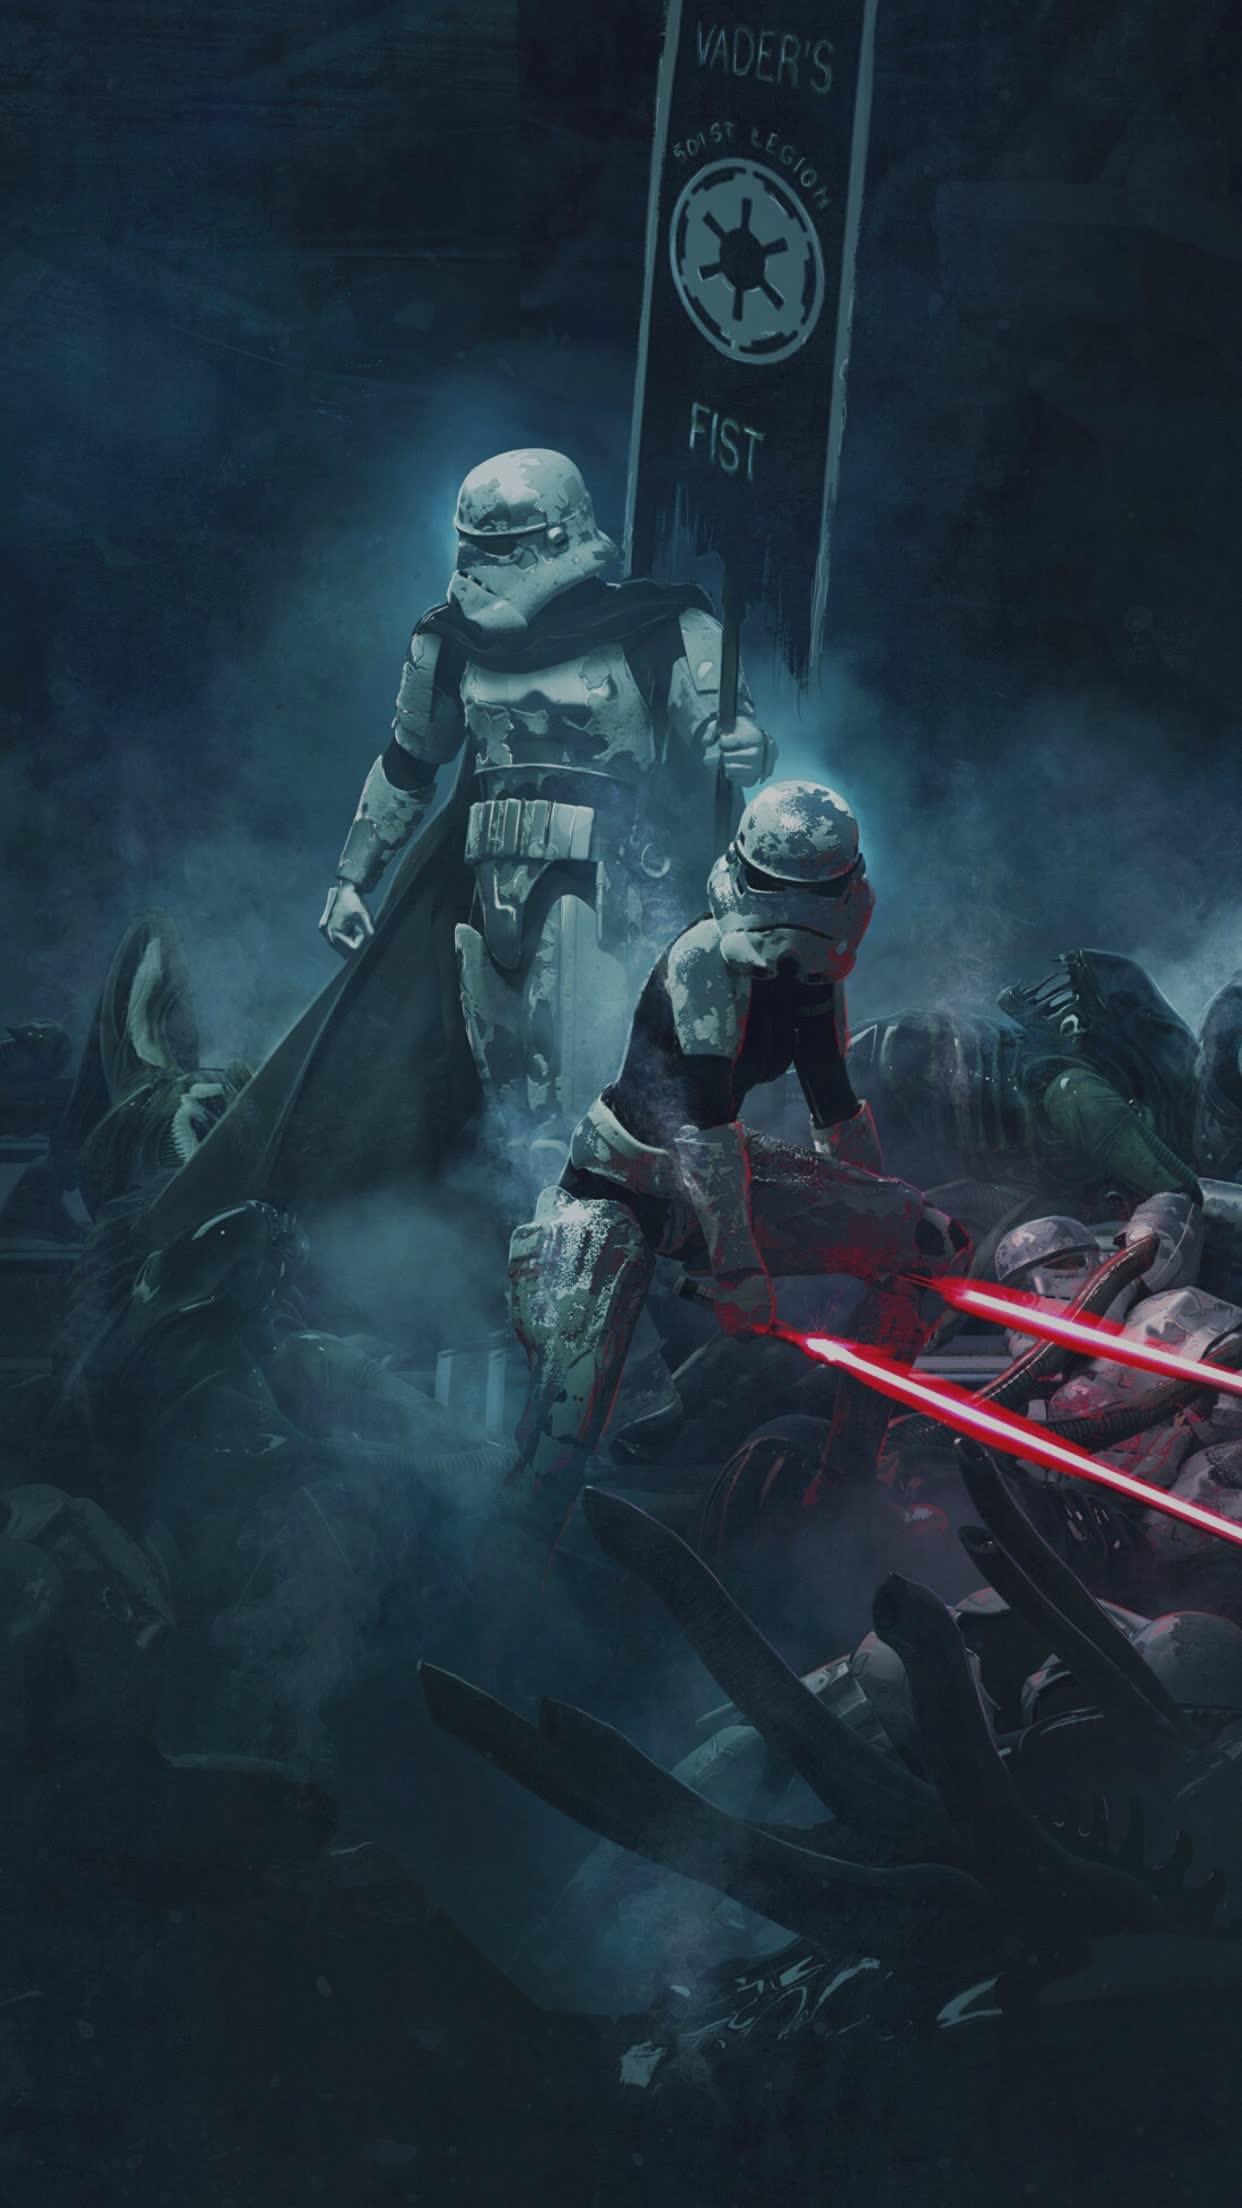 501St Clone Trooper Wallpaper 64 images 1242x2208